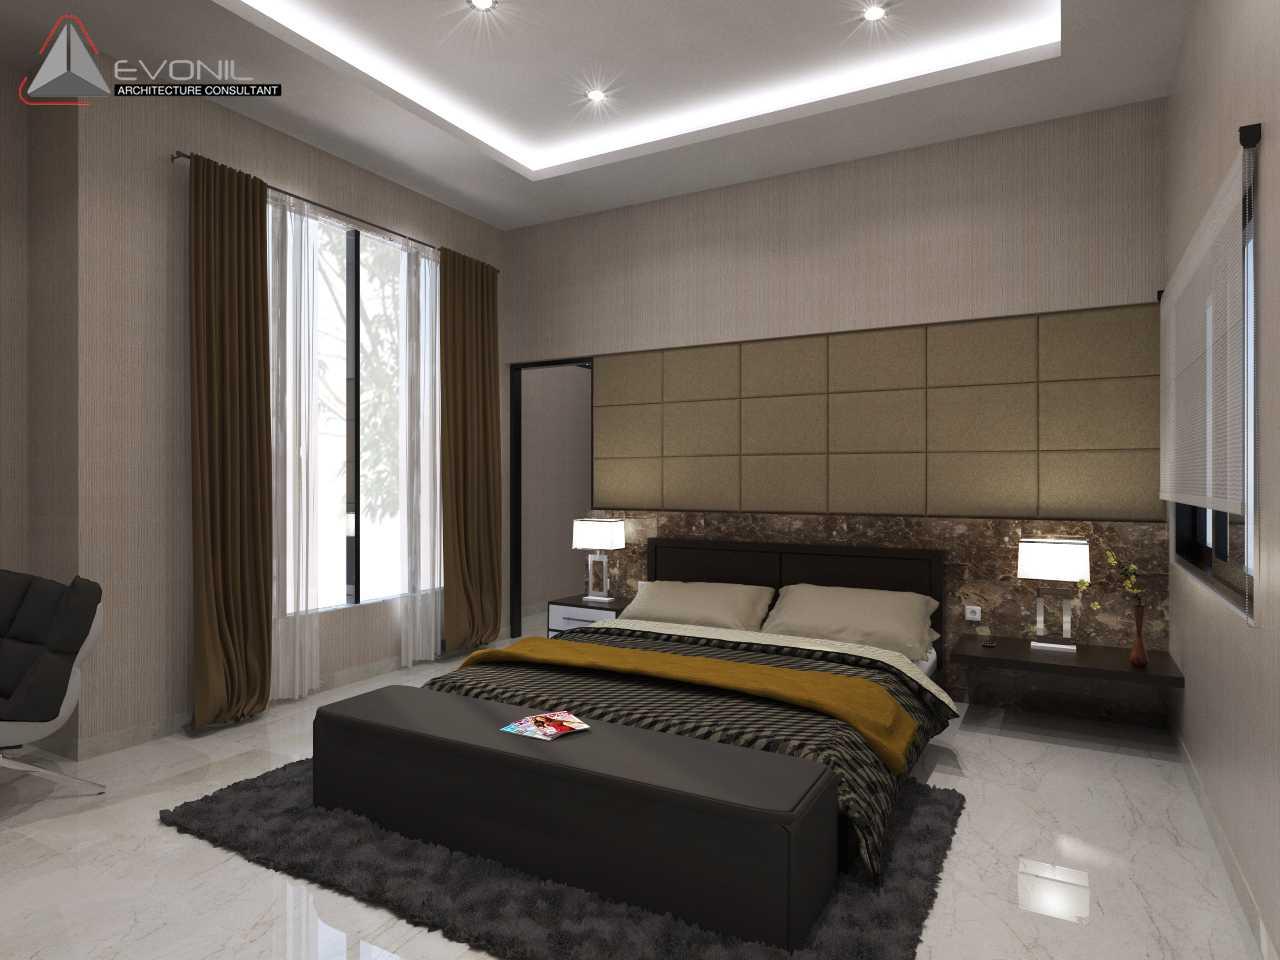 Evonil Architecture Residence Pluit Timur Pluit, Jakarta Pluit, Jakarta Master-Bedroom-1-View-1-Kop Asian  13030